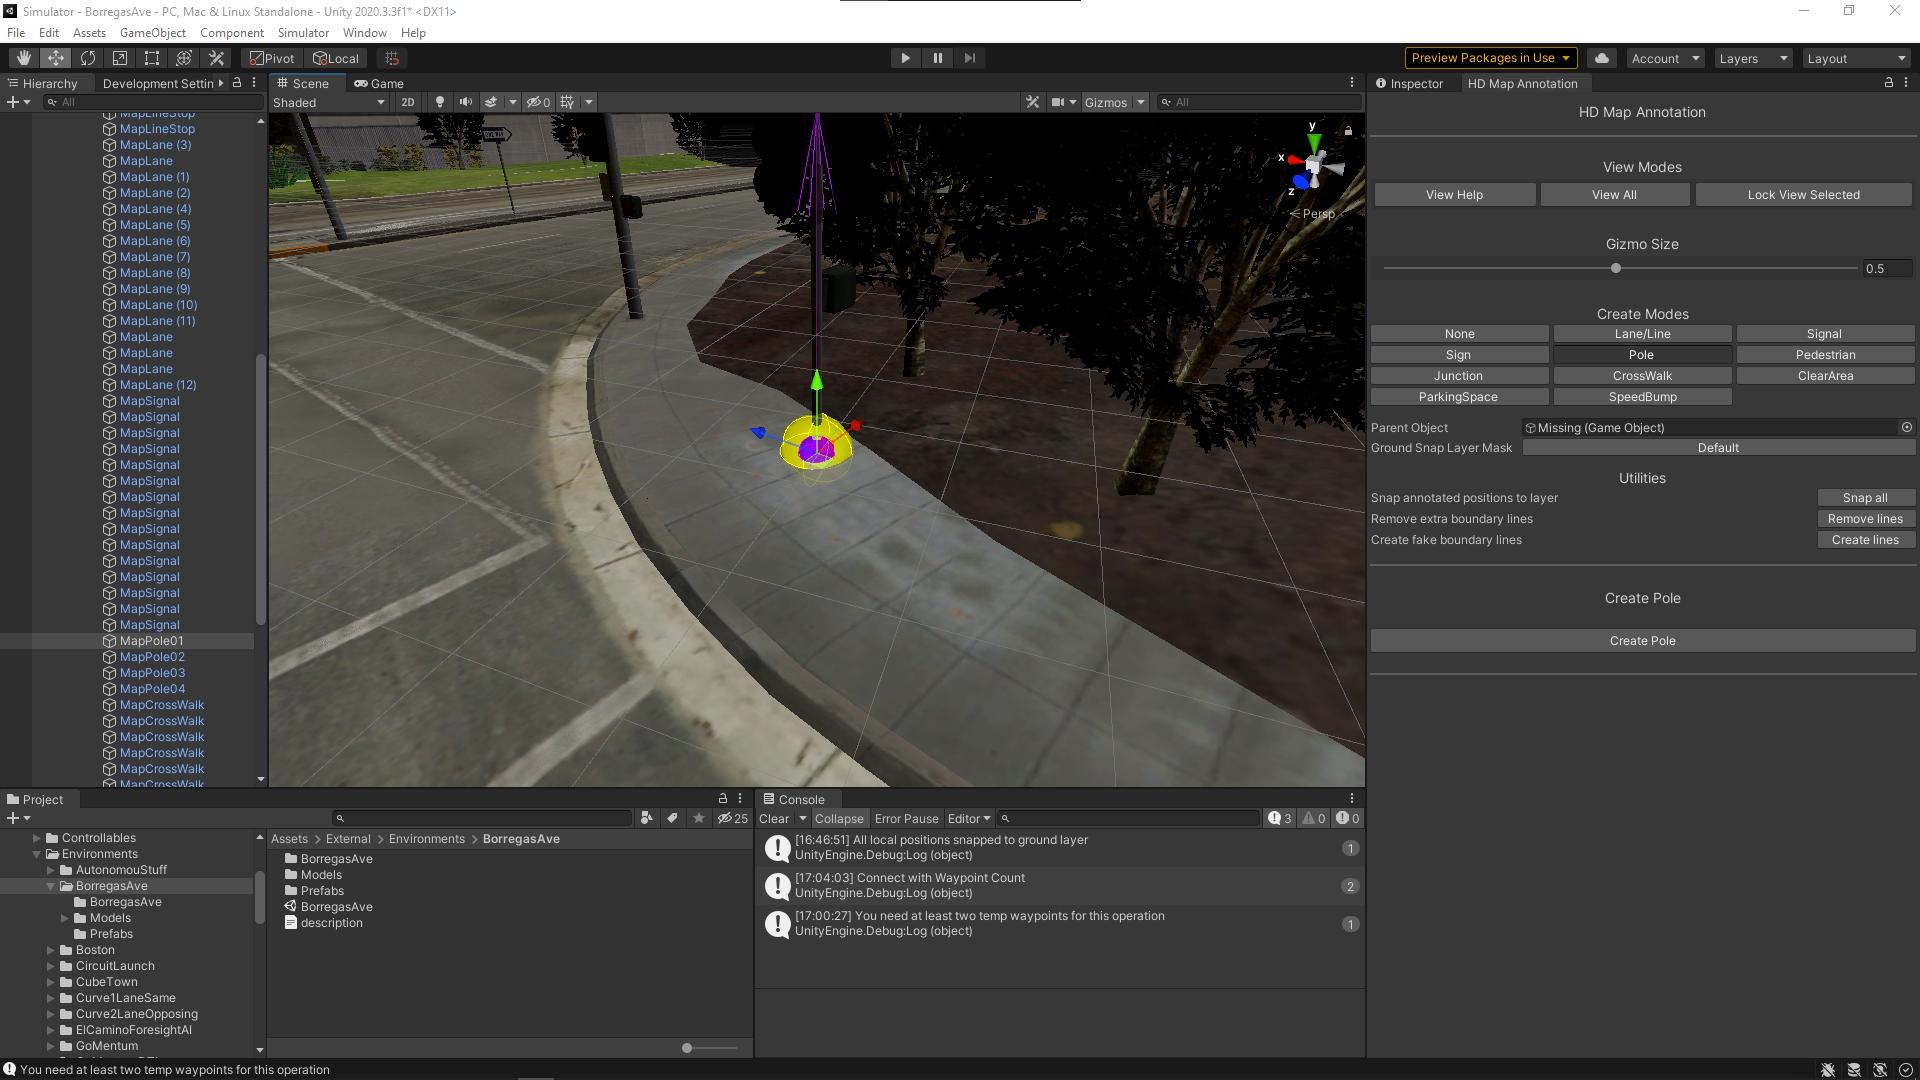 Map Annotation - LGSVL Simulator